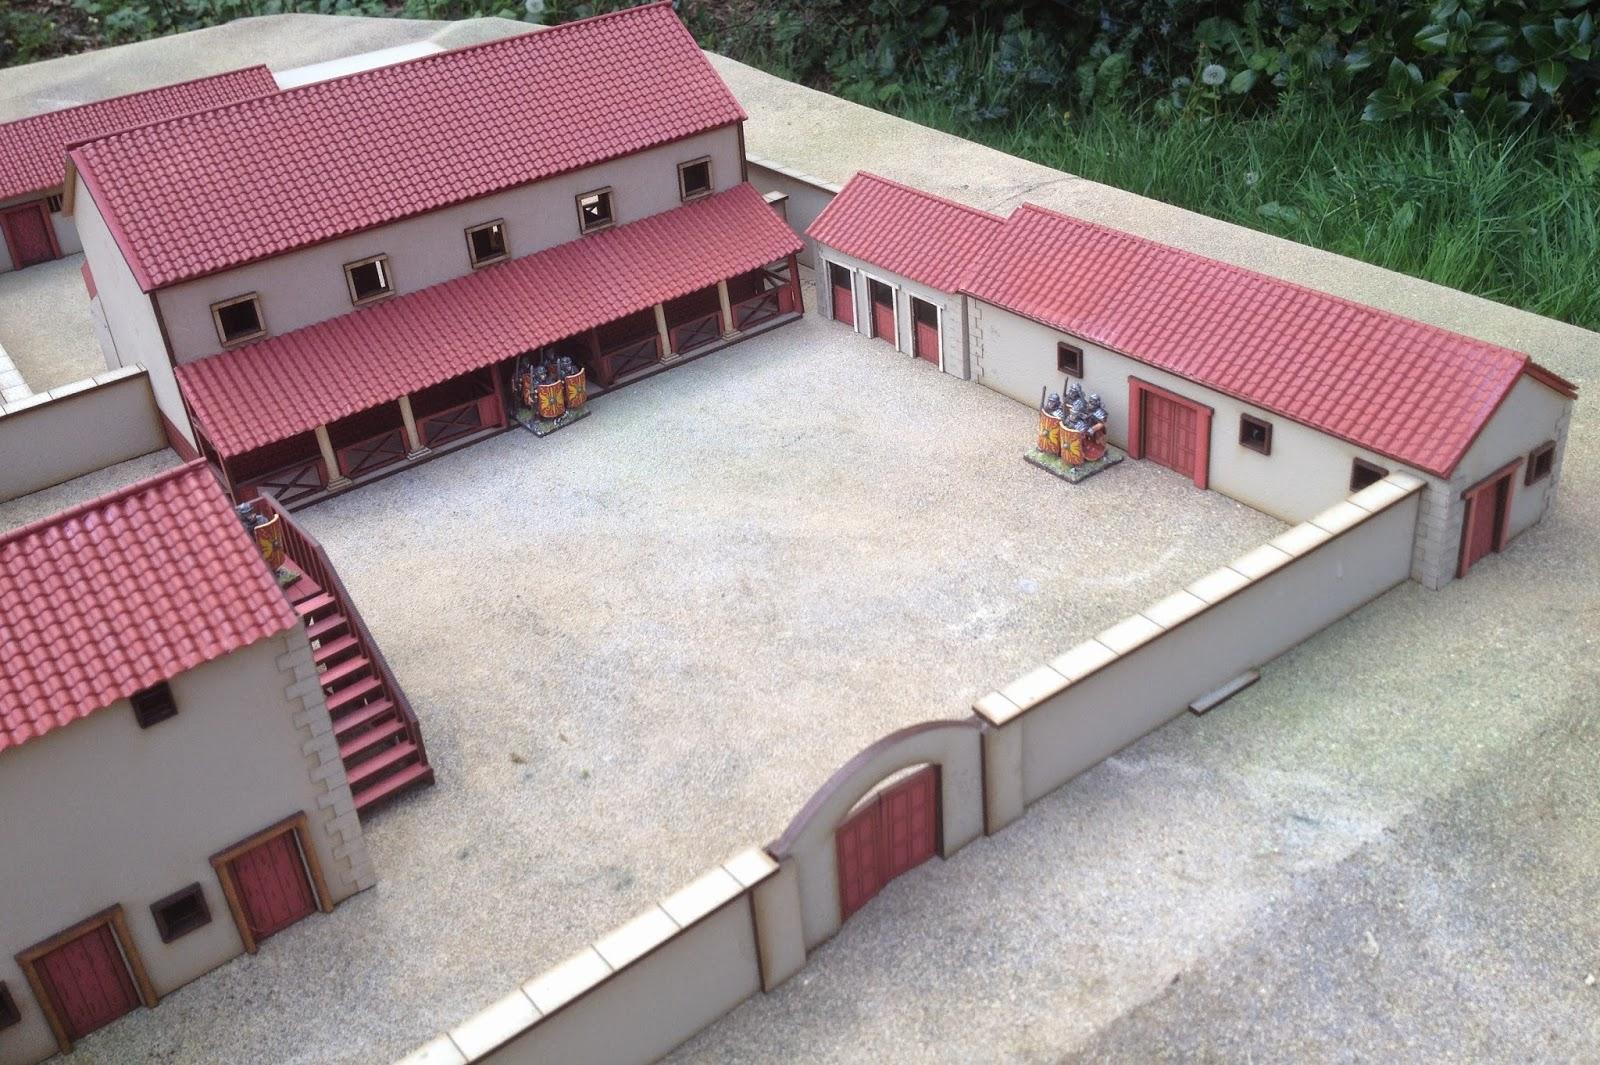 how to make a roman villa model